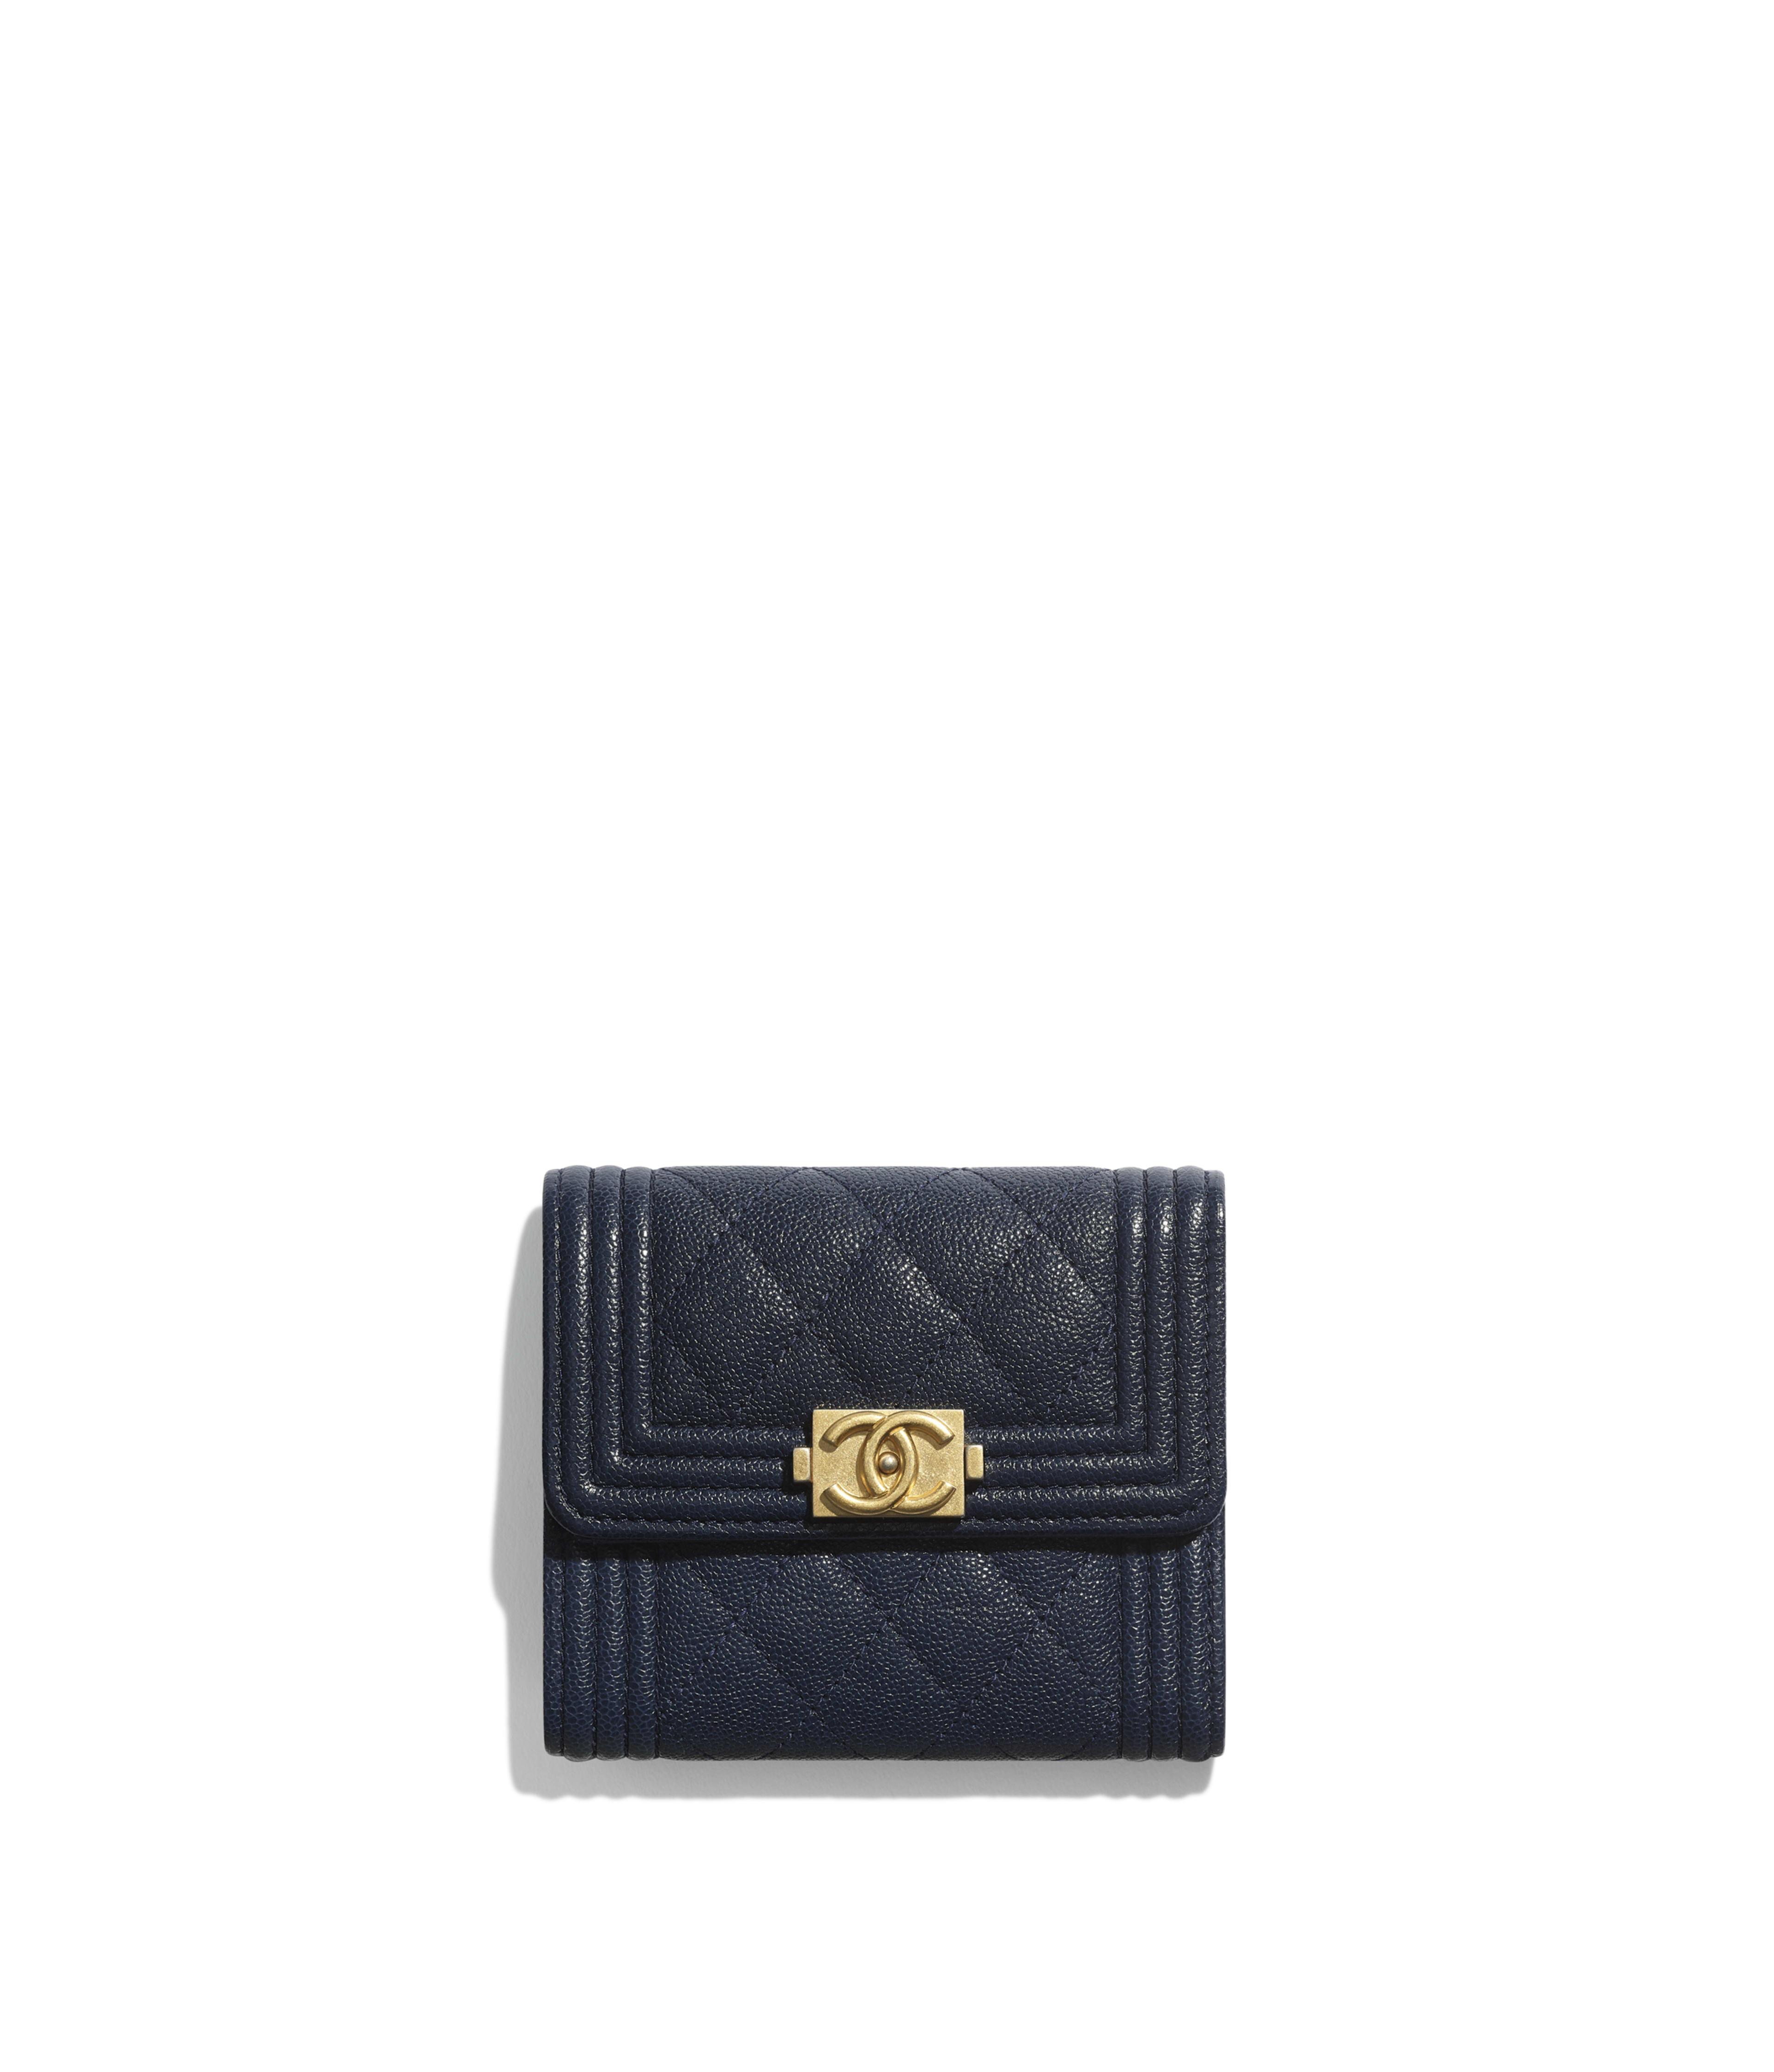 BOY CHANEL Small Flap Wallet Grained Calfskin   Gold-Tone Metal dd1858da6